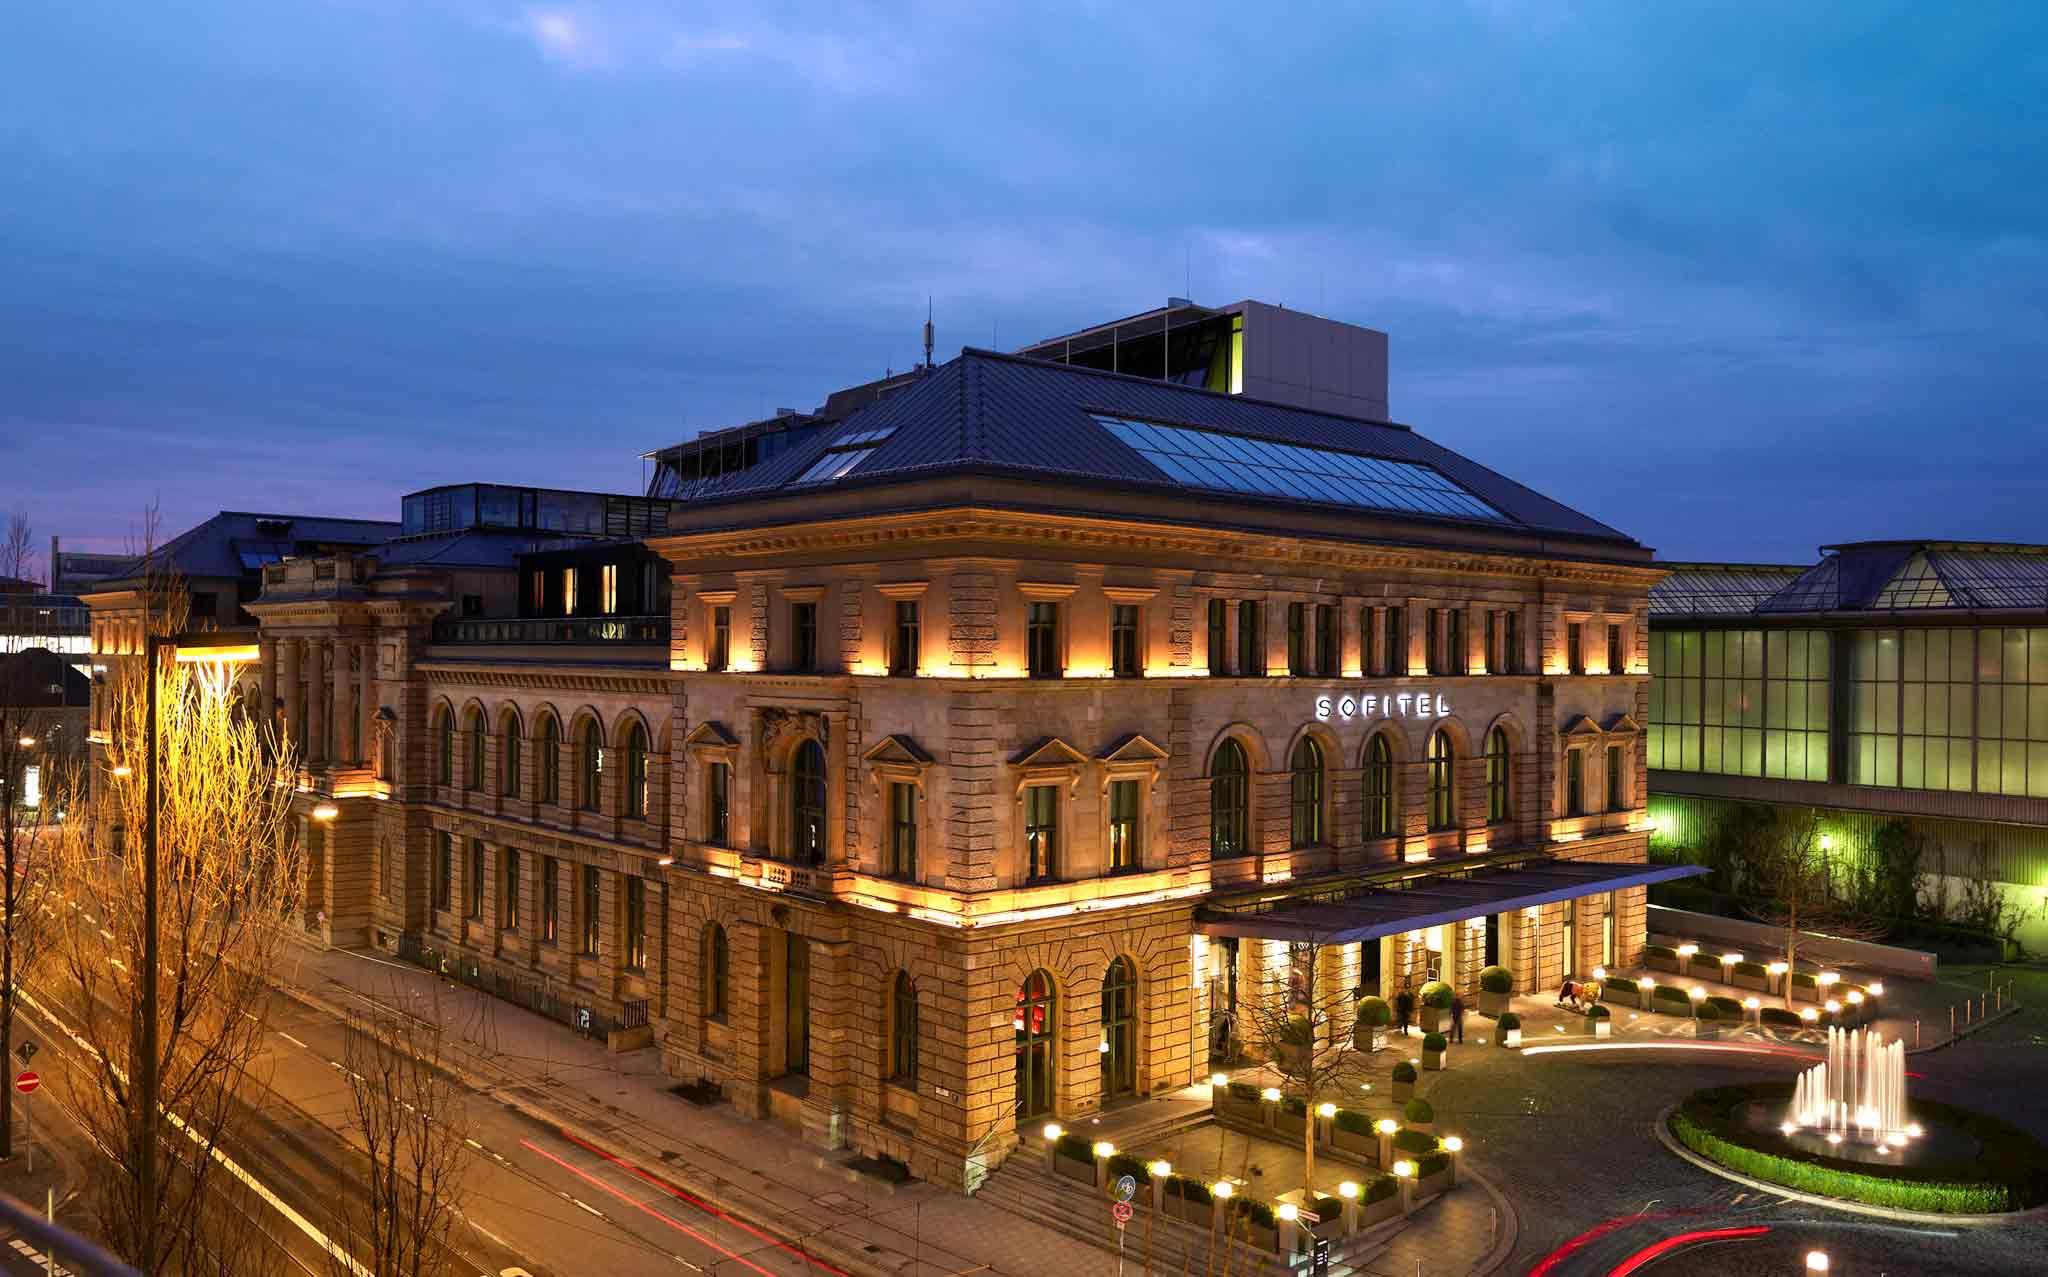 Hotel – Sofitel Munich Bayerpost